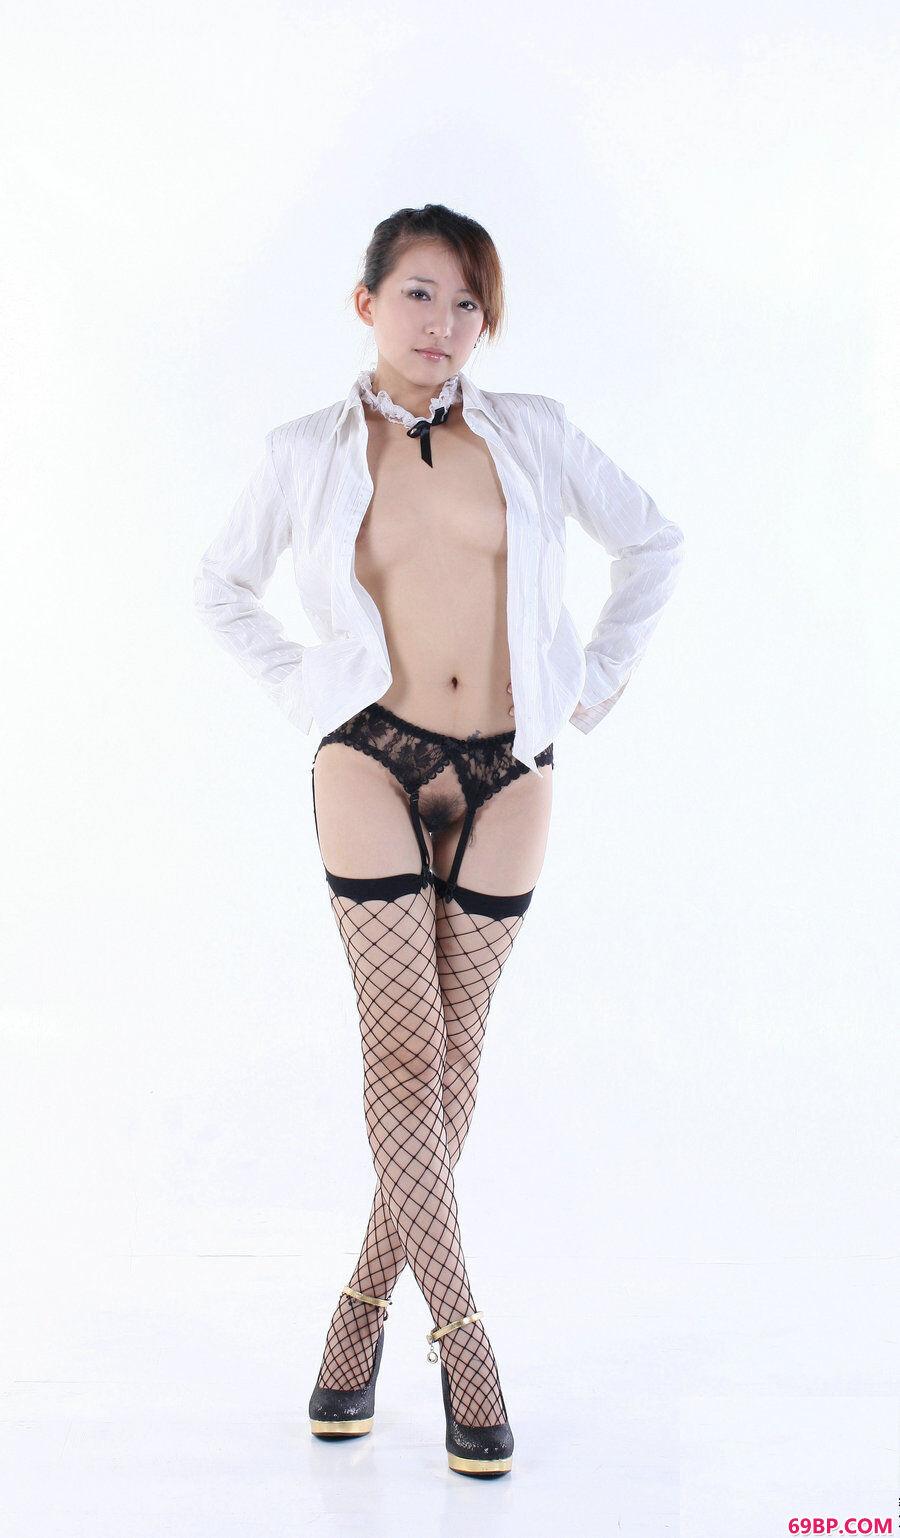 gogo嫩模香香丝袜丝袜艺术造型